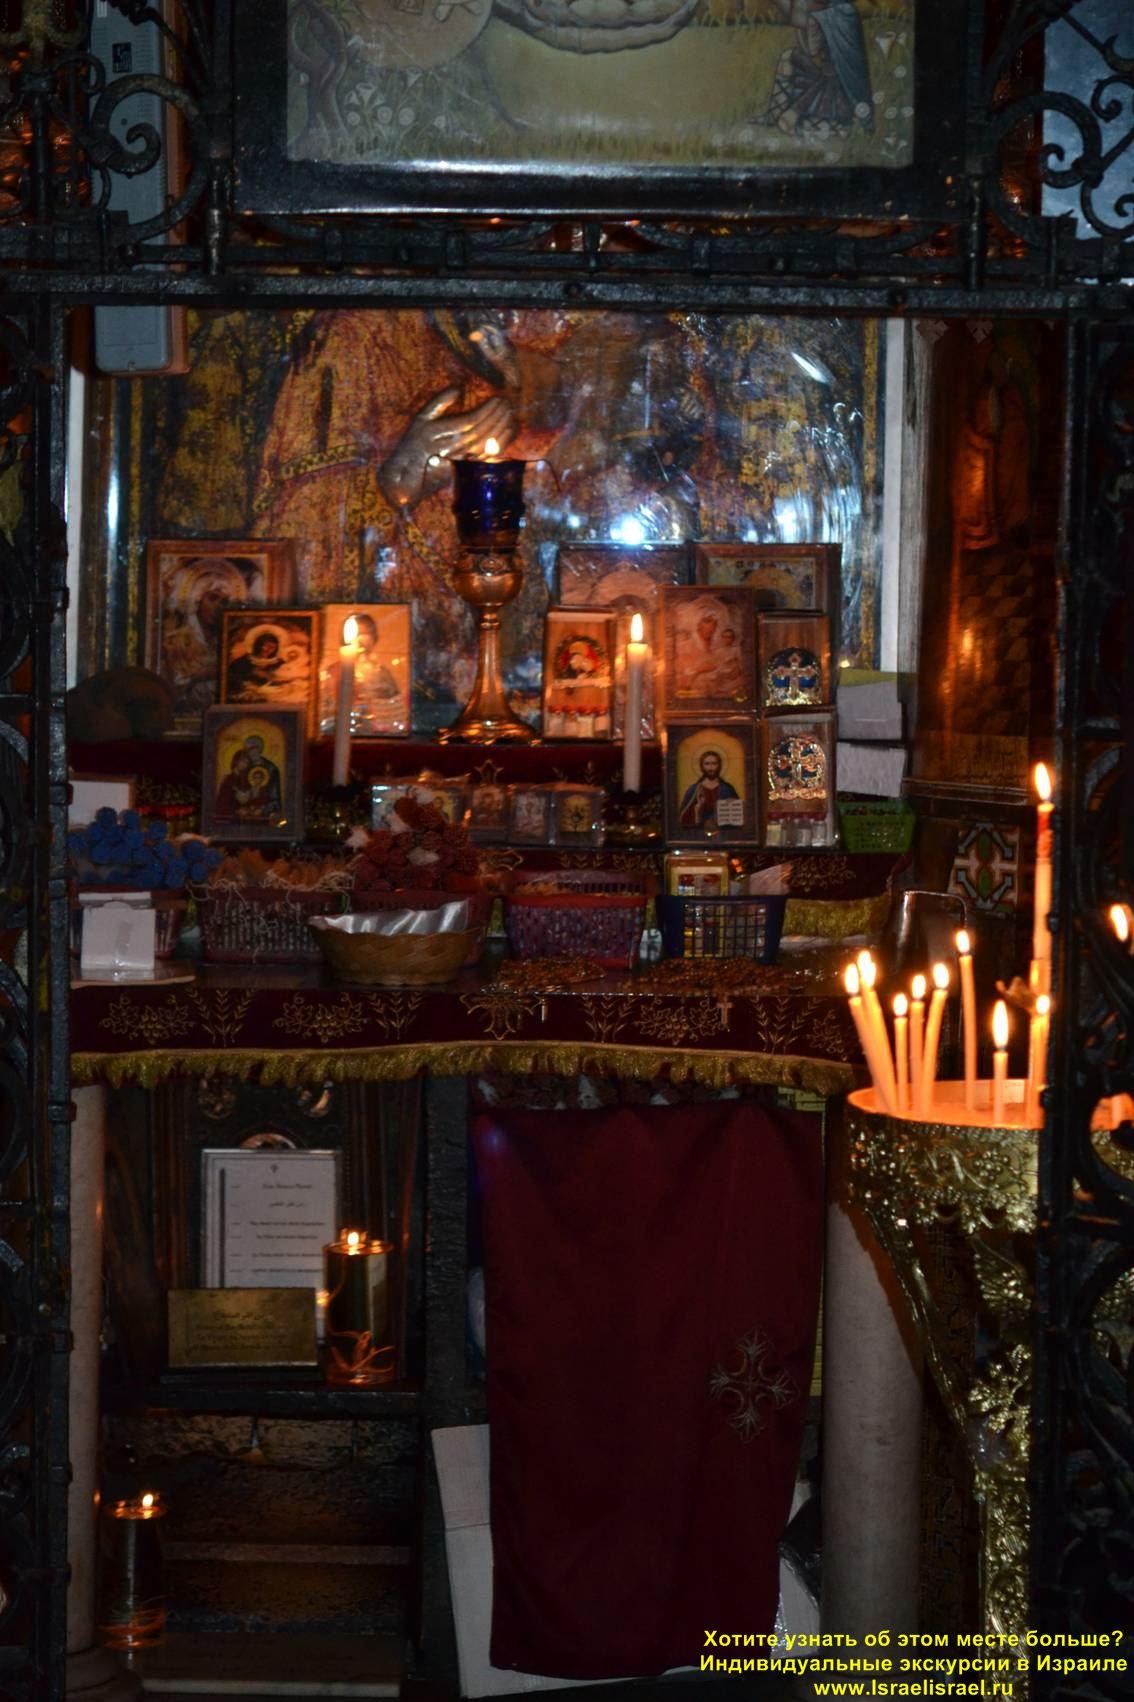 Ethiopia as part of the Coptic Church